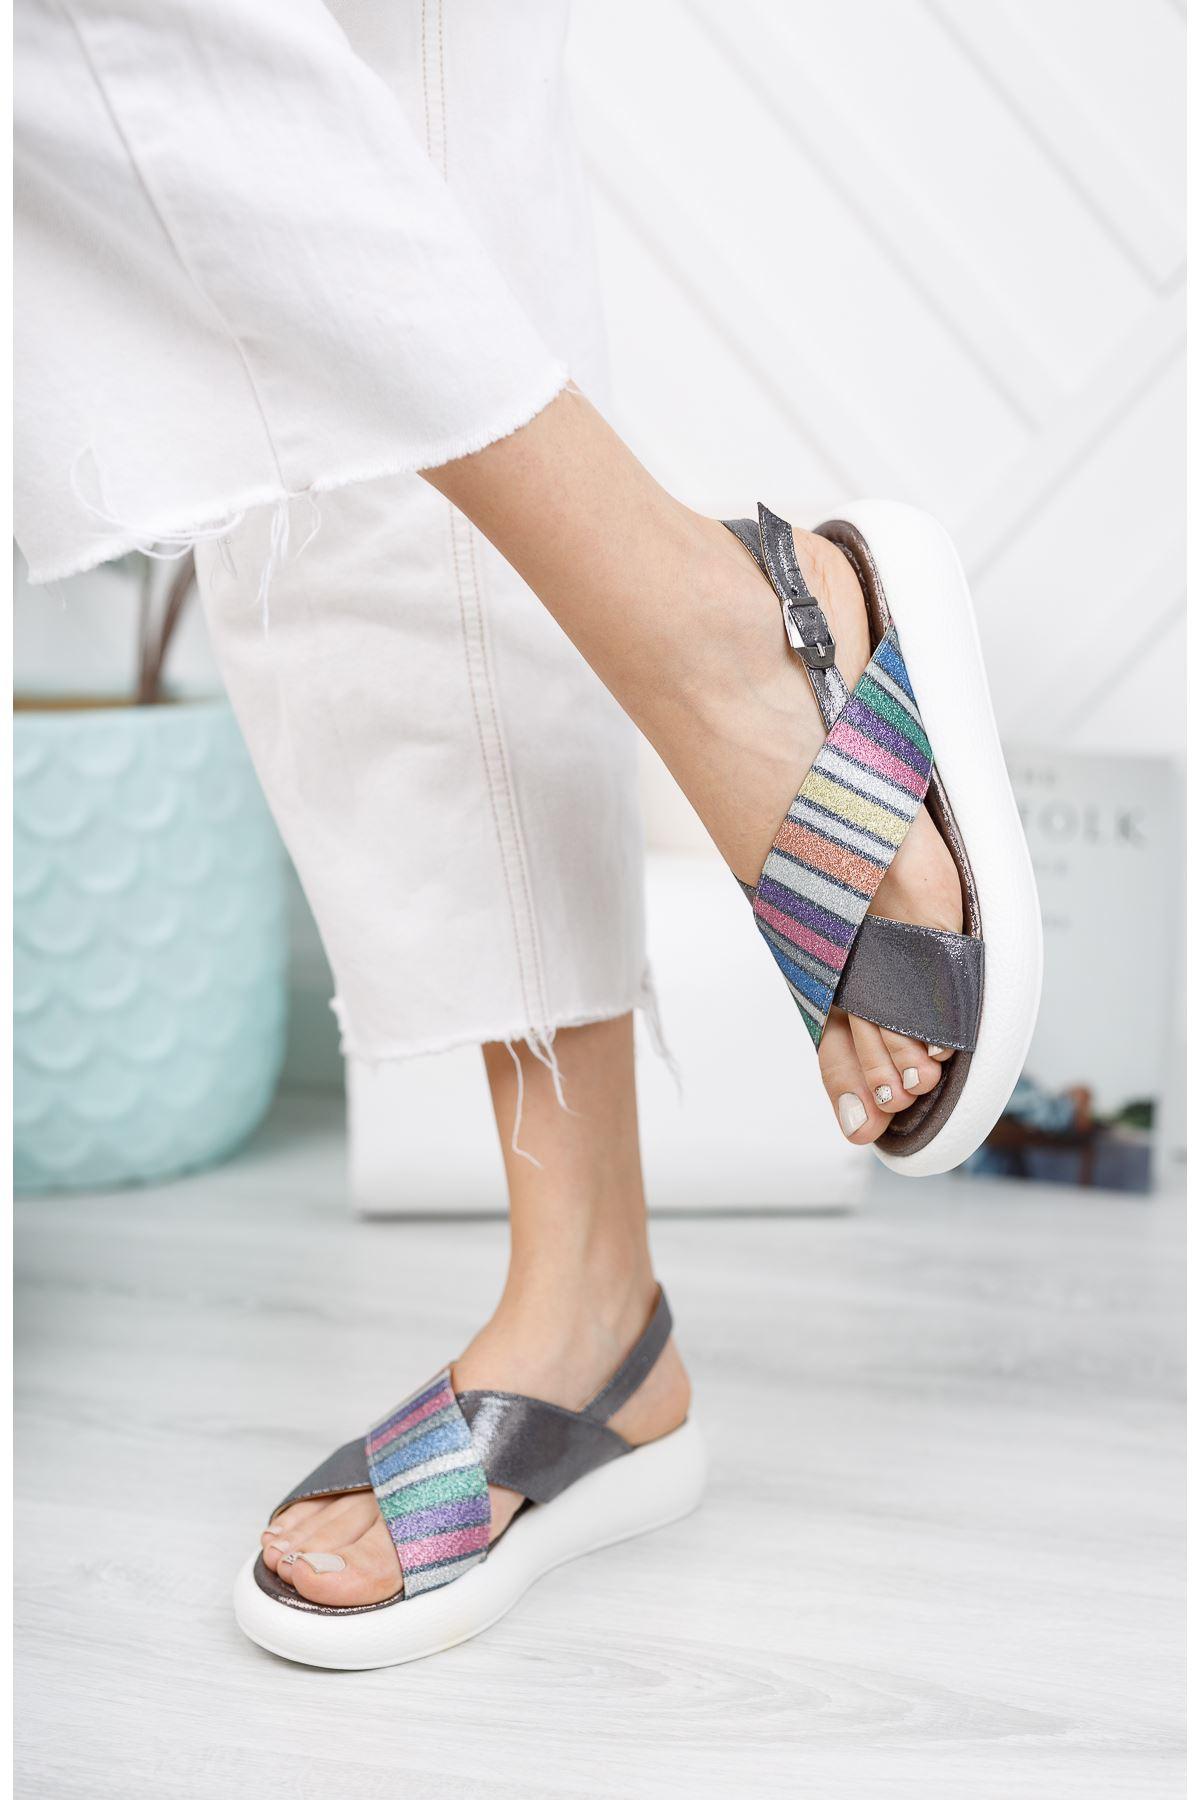 Platin Çapraz 4 Cm Taban Sandalet